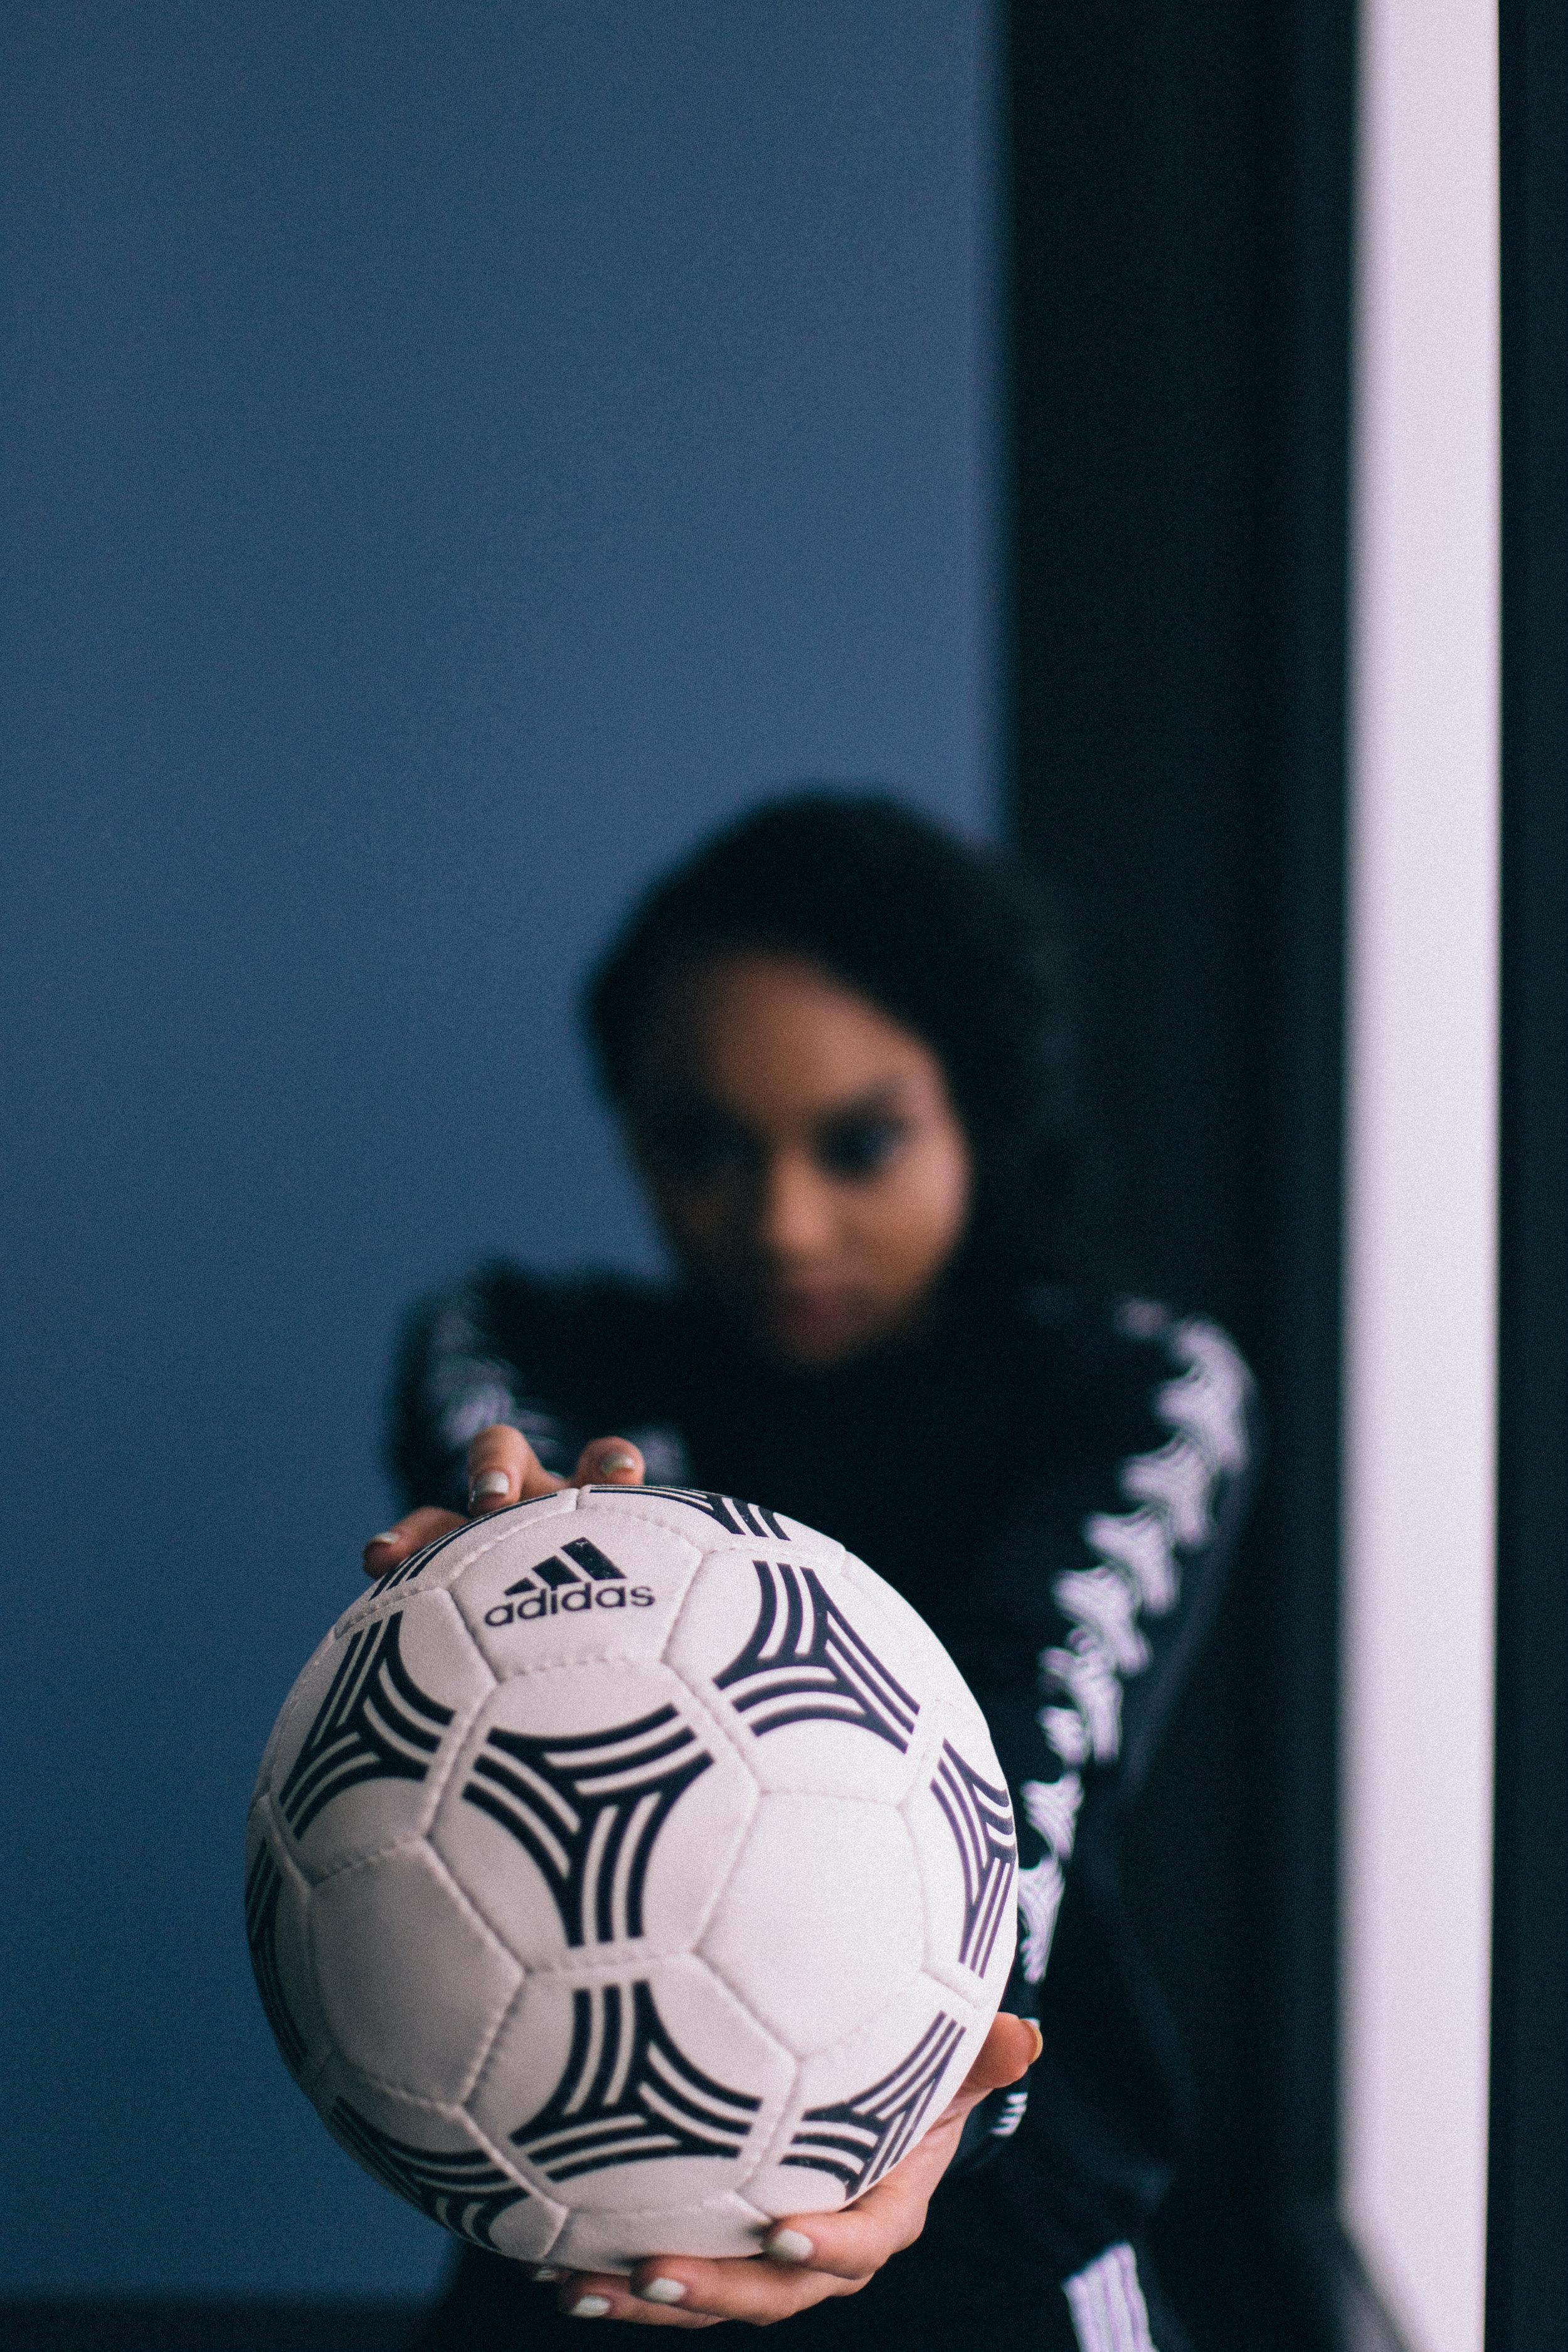 Adidas_Dollyave_007